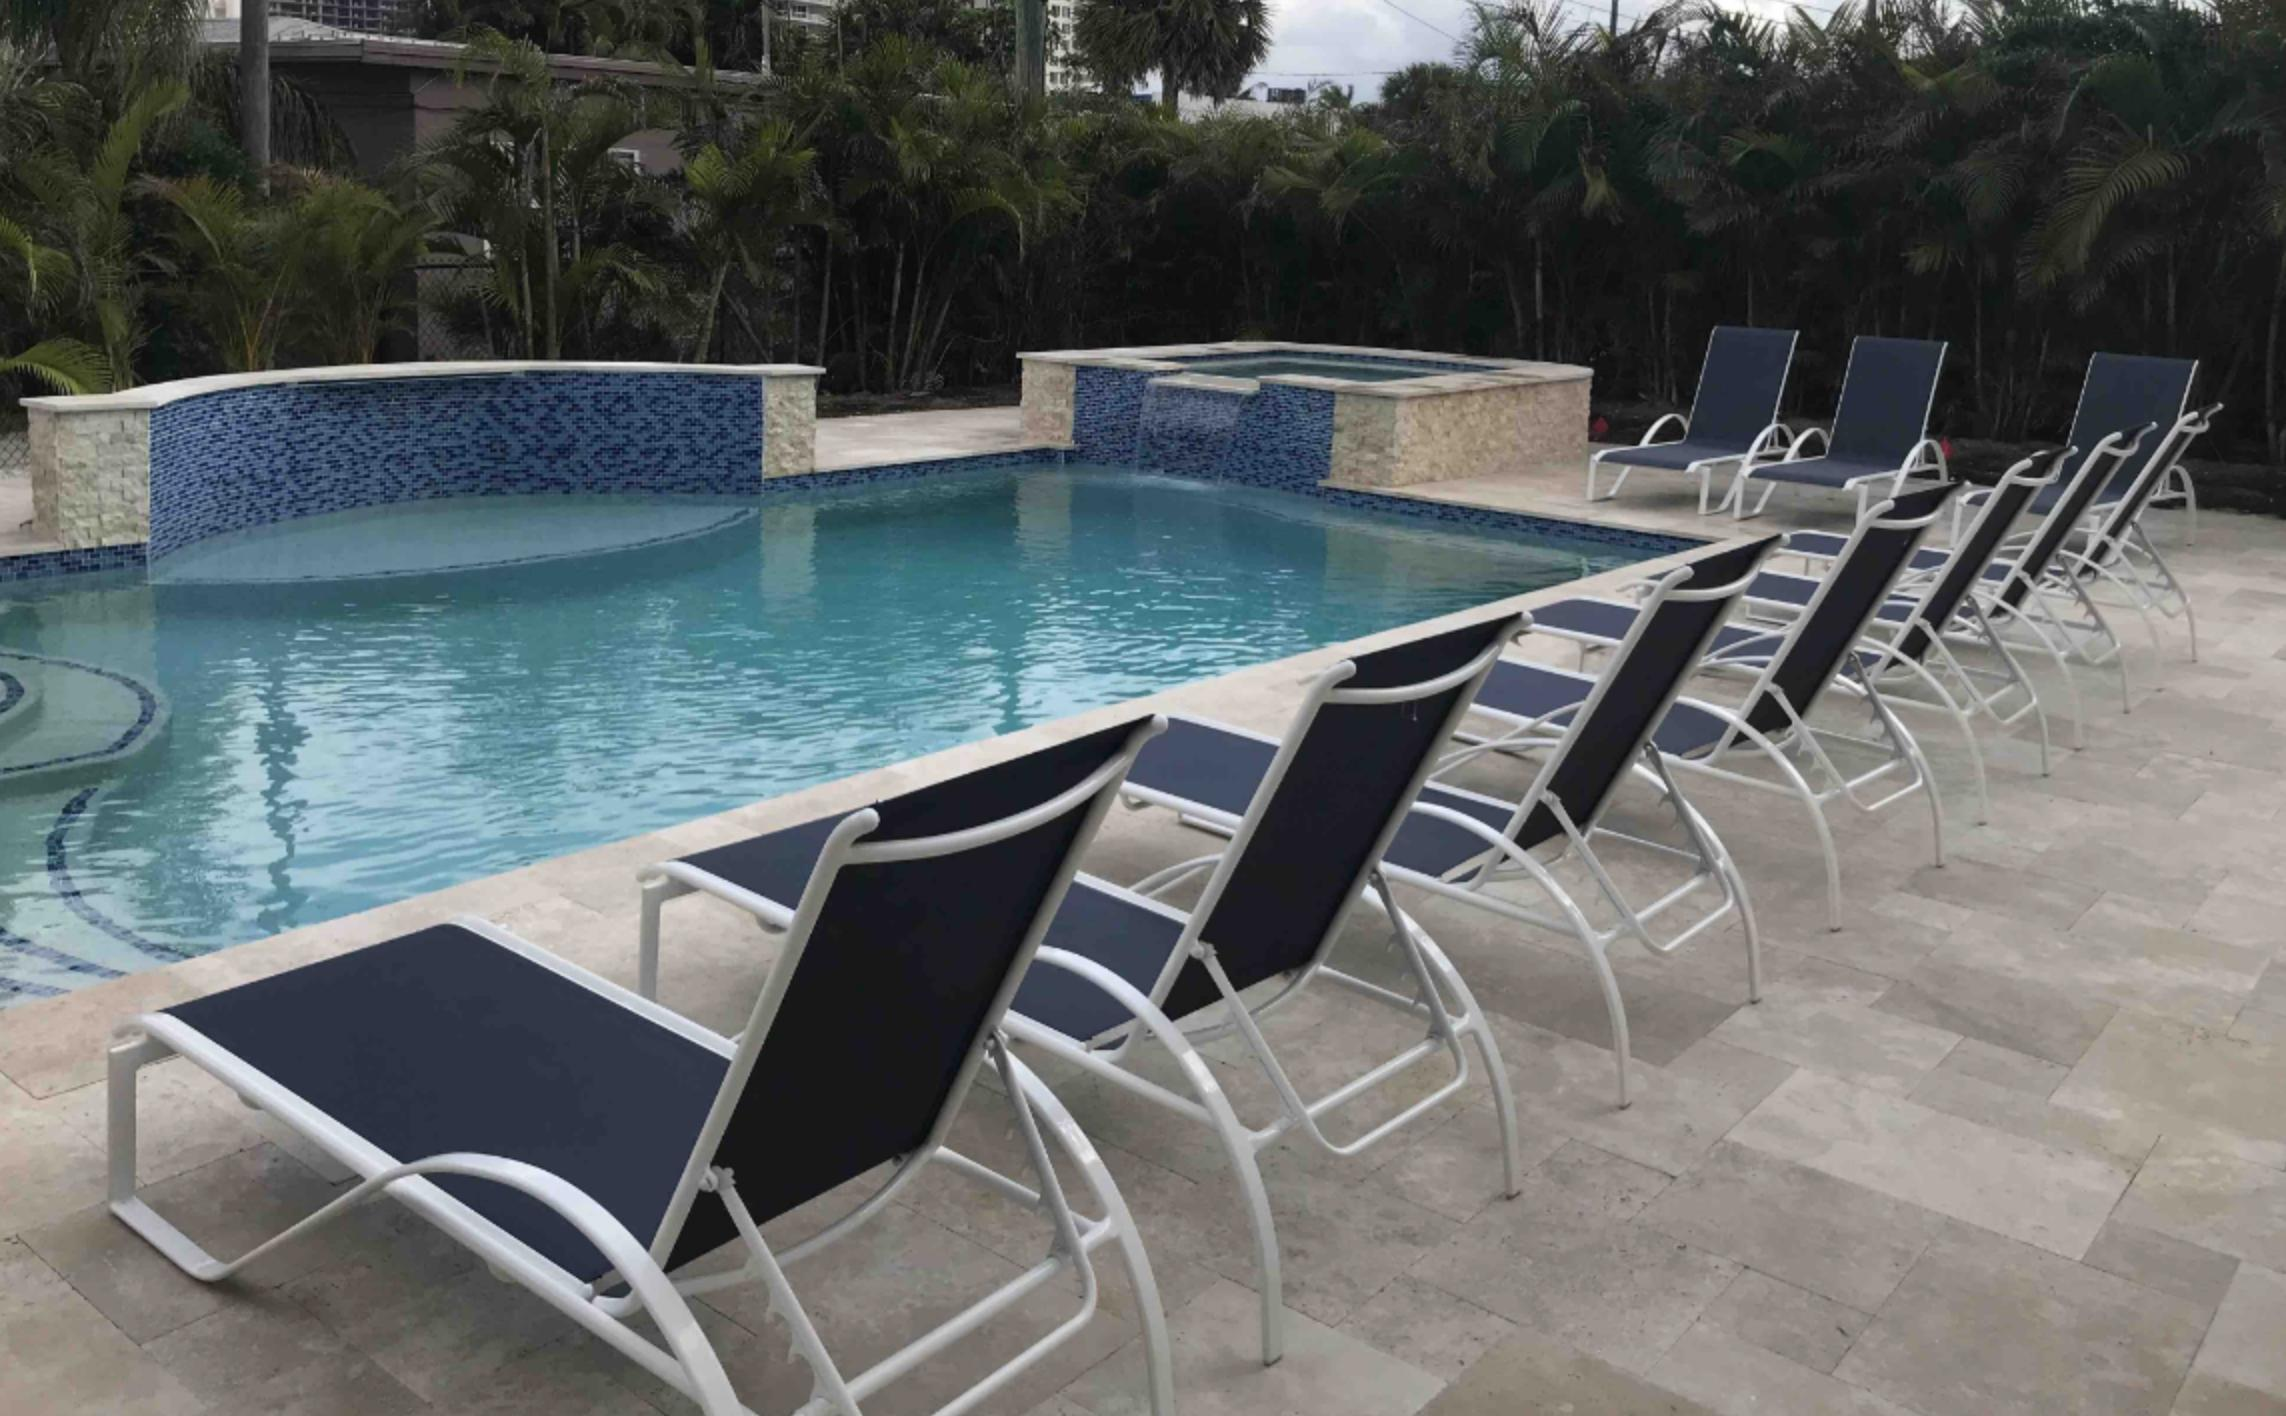 1236 Beach Road, 1, Riviera Beach, FL 33404 - Olga Delbusto